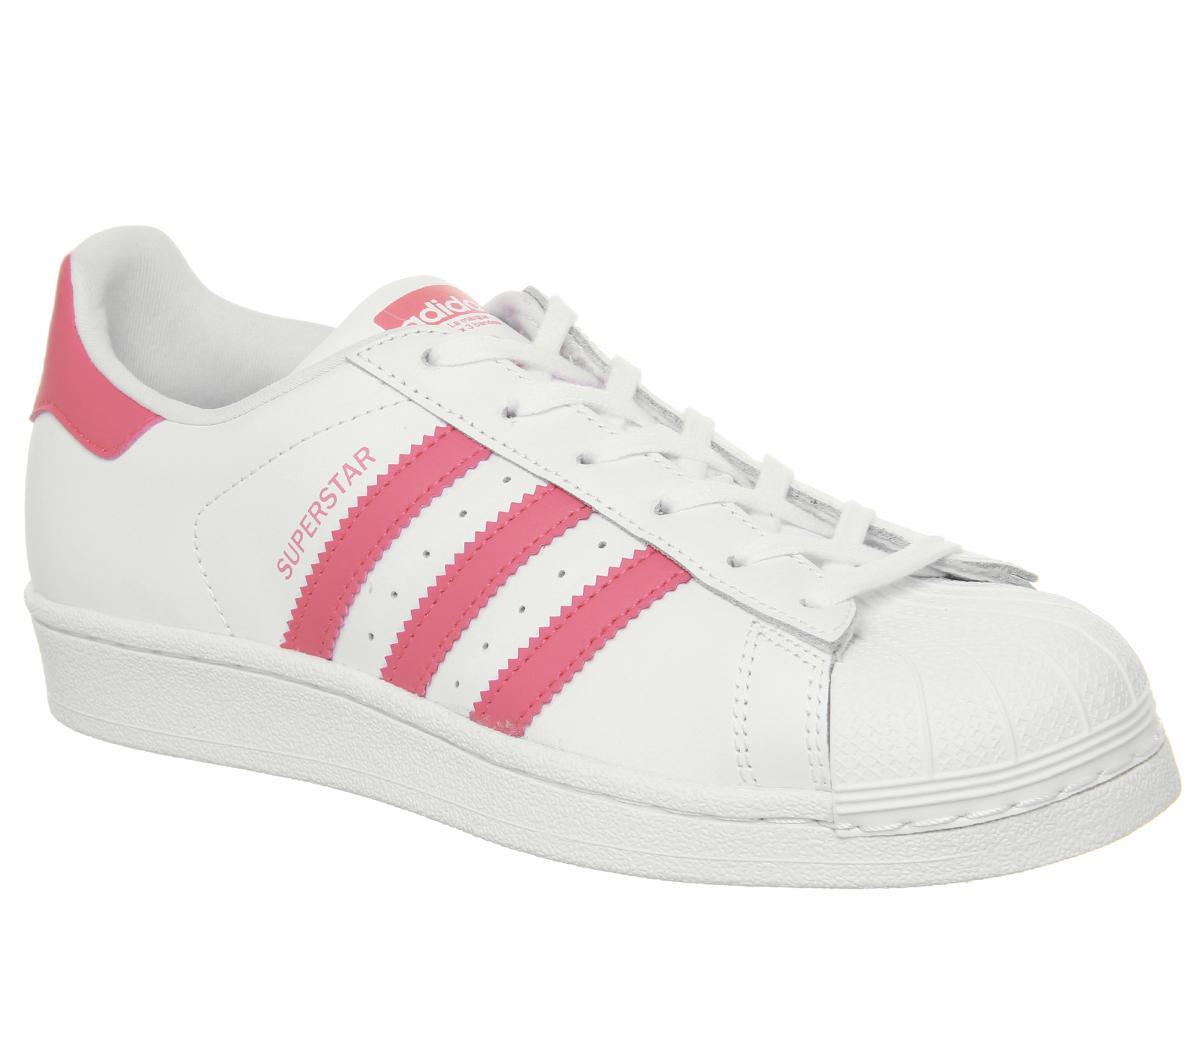 adidas. Women s Superstar Gs Trainers e8e7a447f2b7